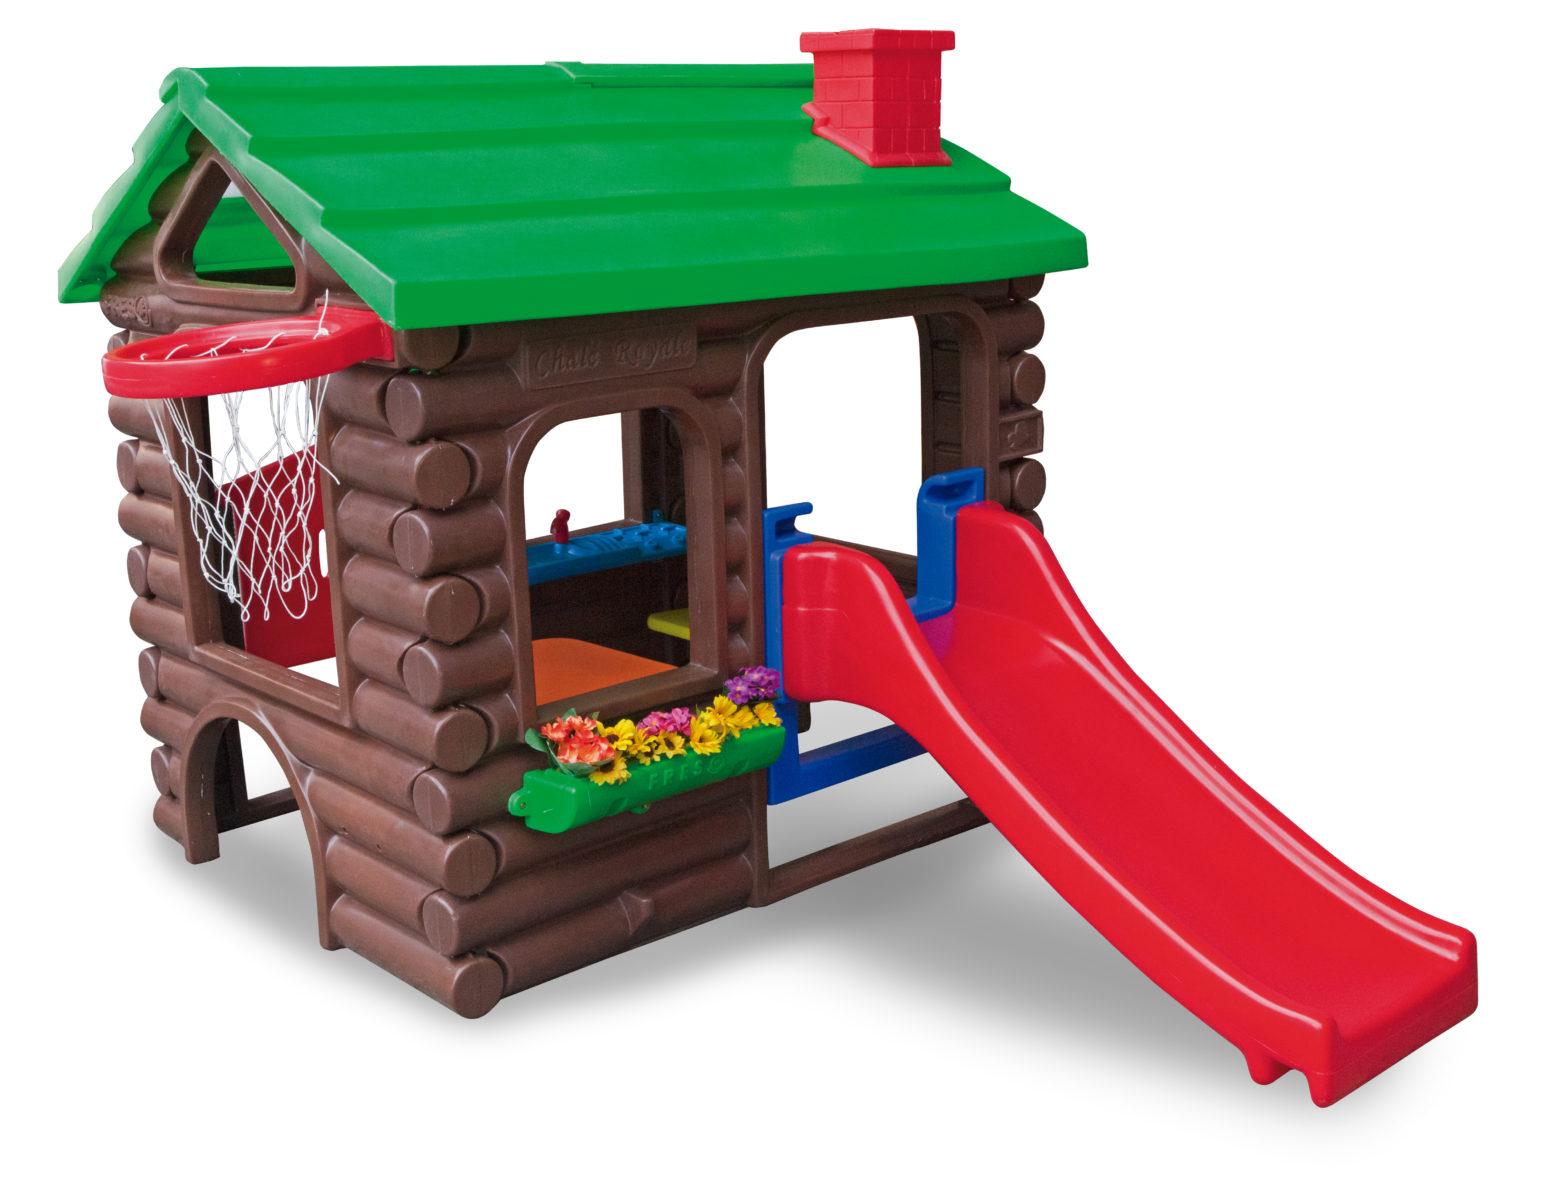 Kit Playground Completo - Bemboladas